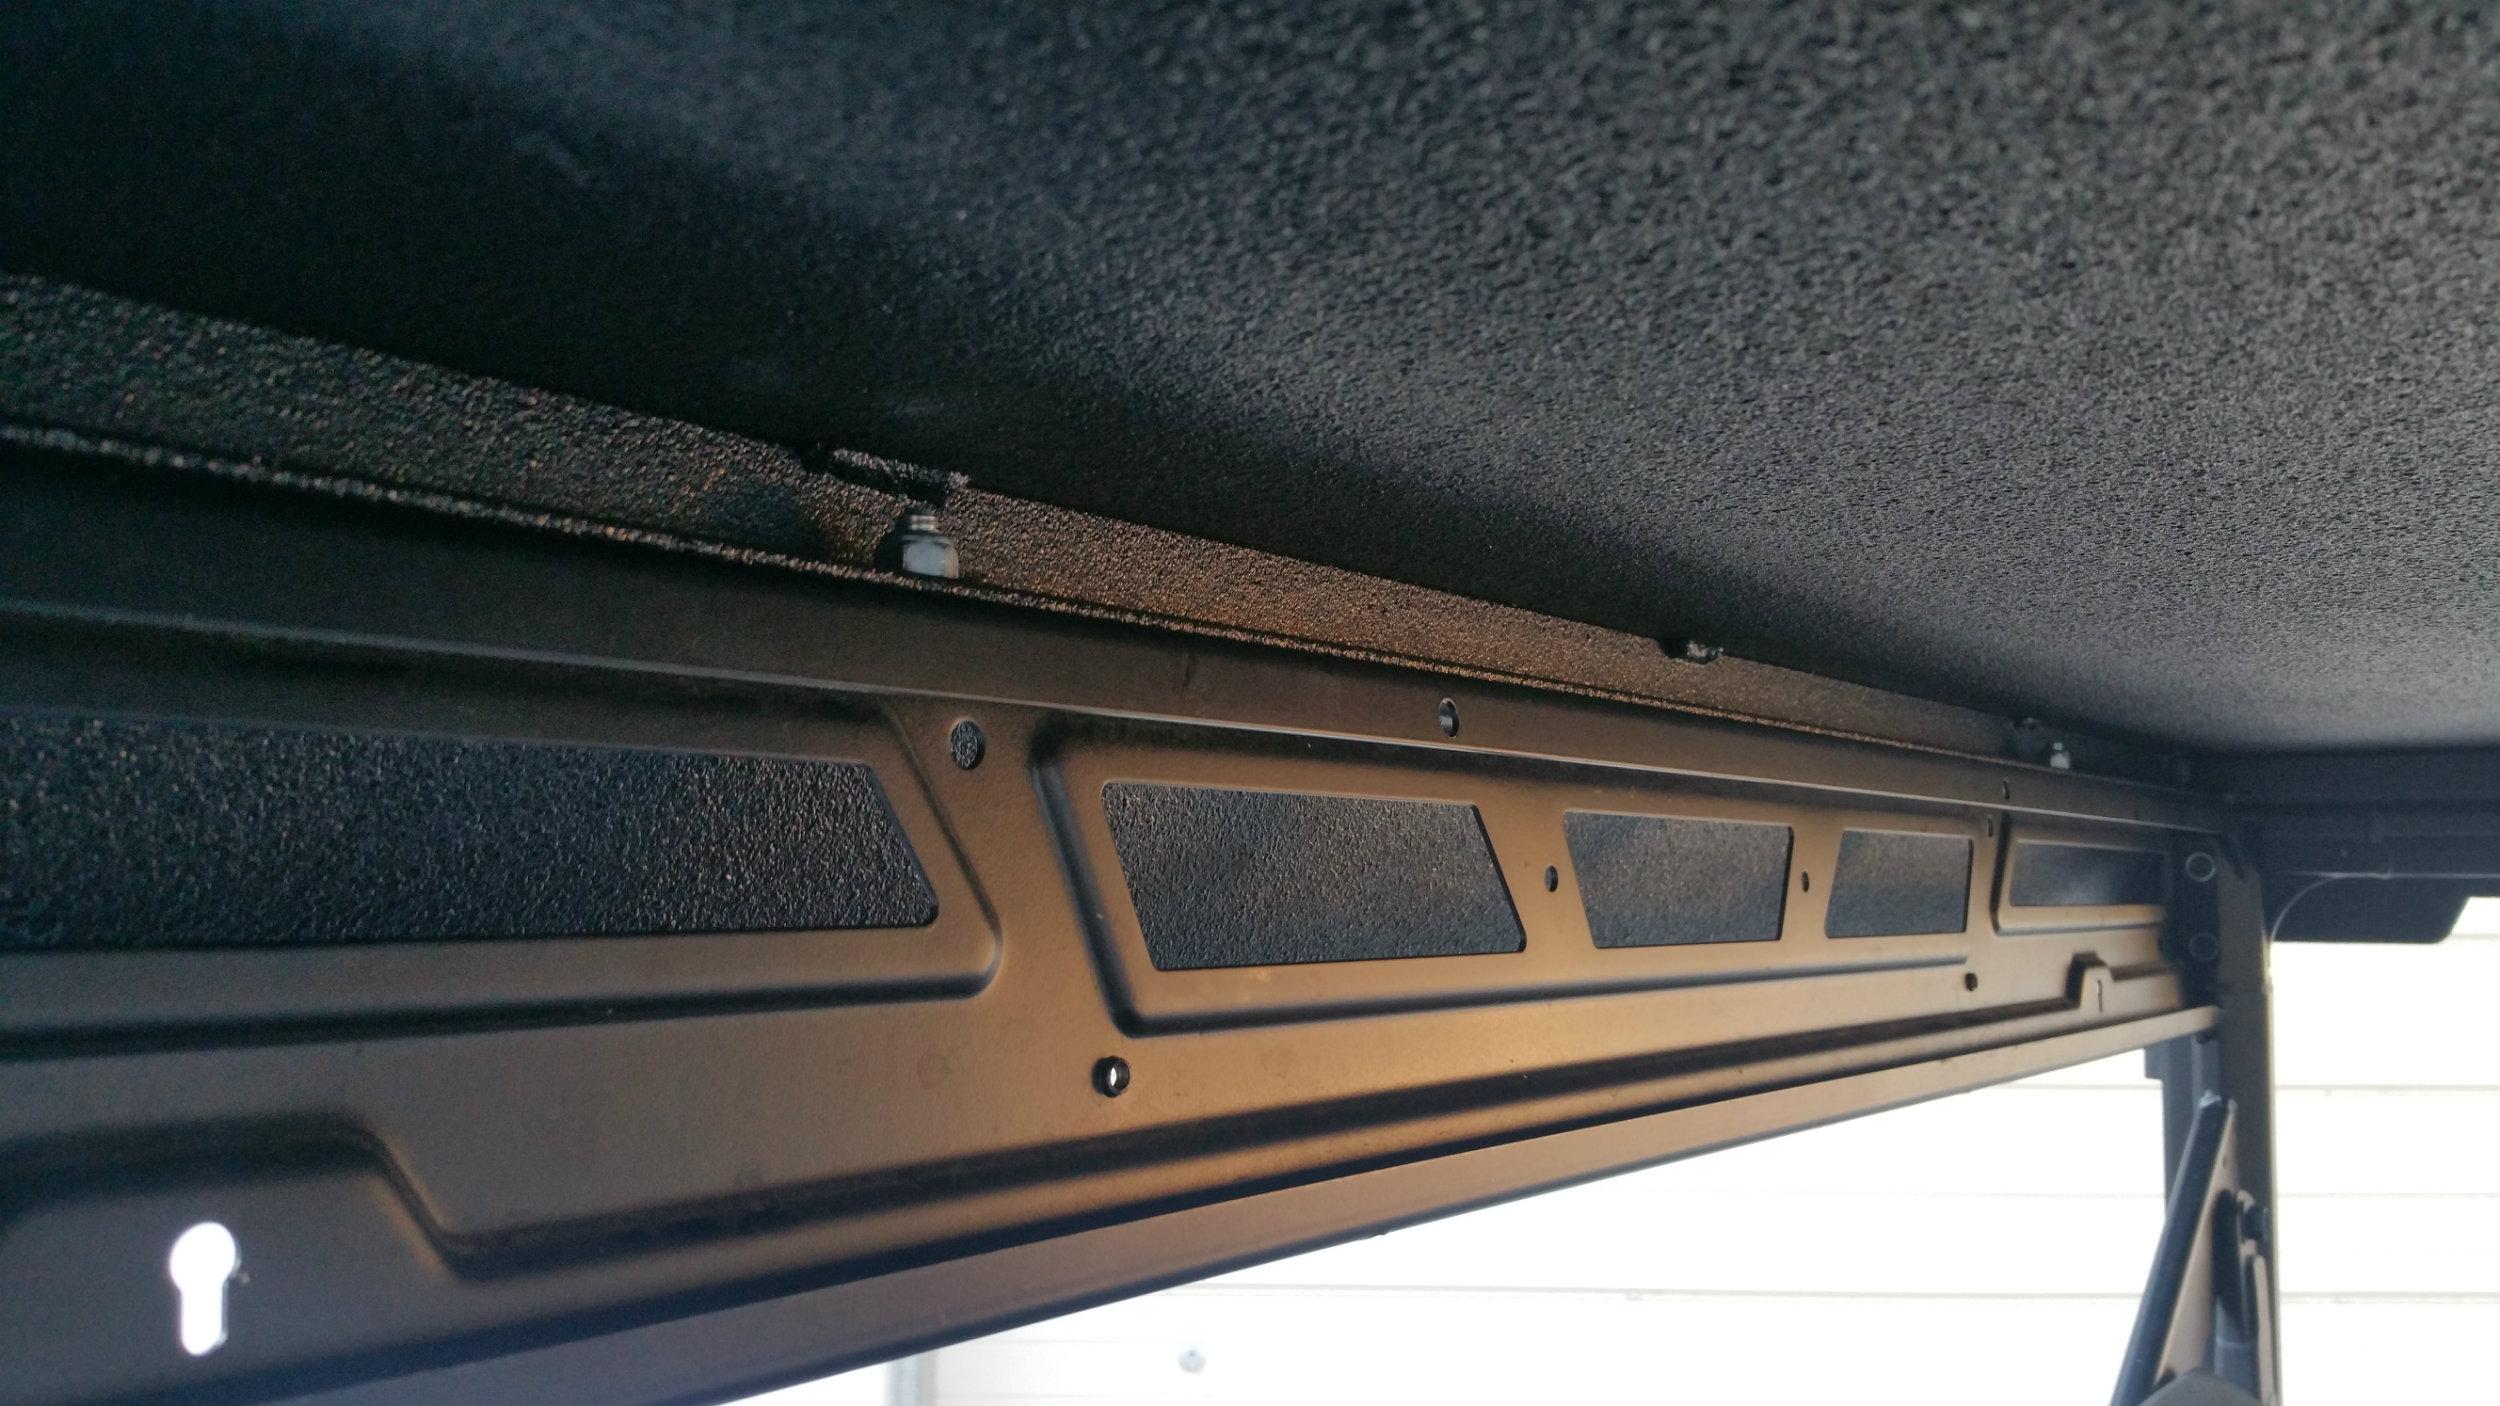 One Piece Polaris Ranger Metal Roof Underside mounted to frame